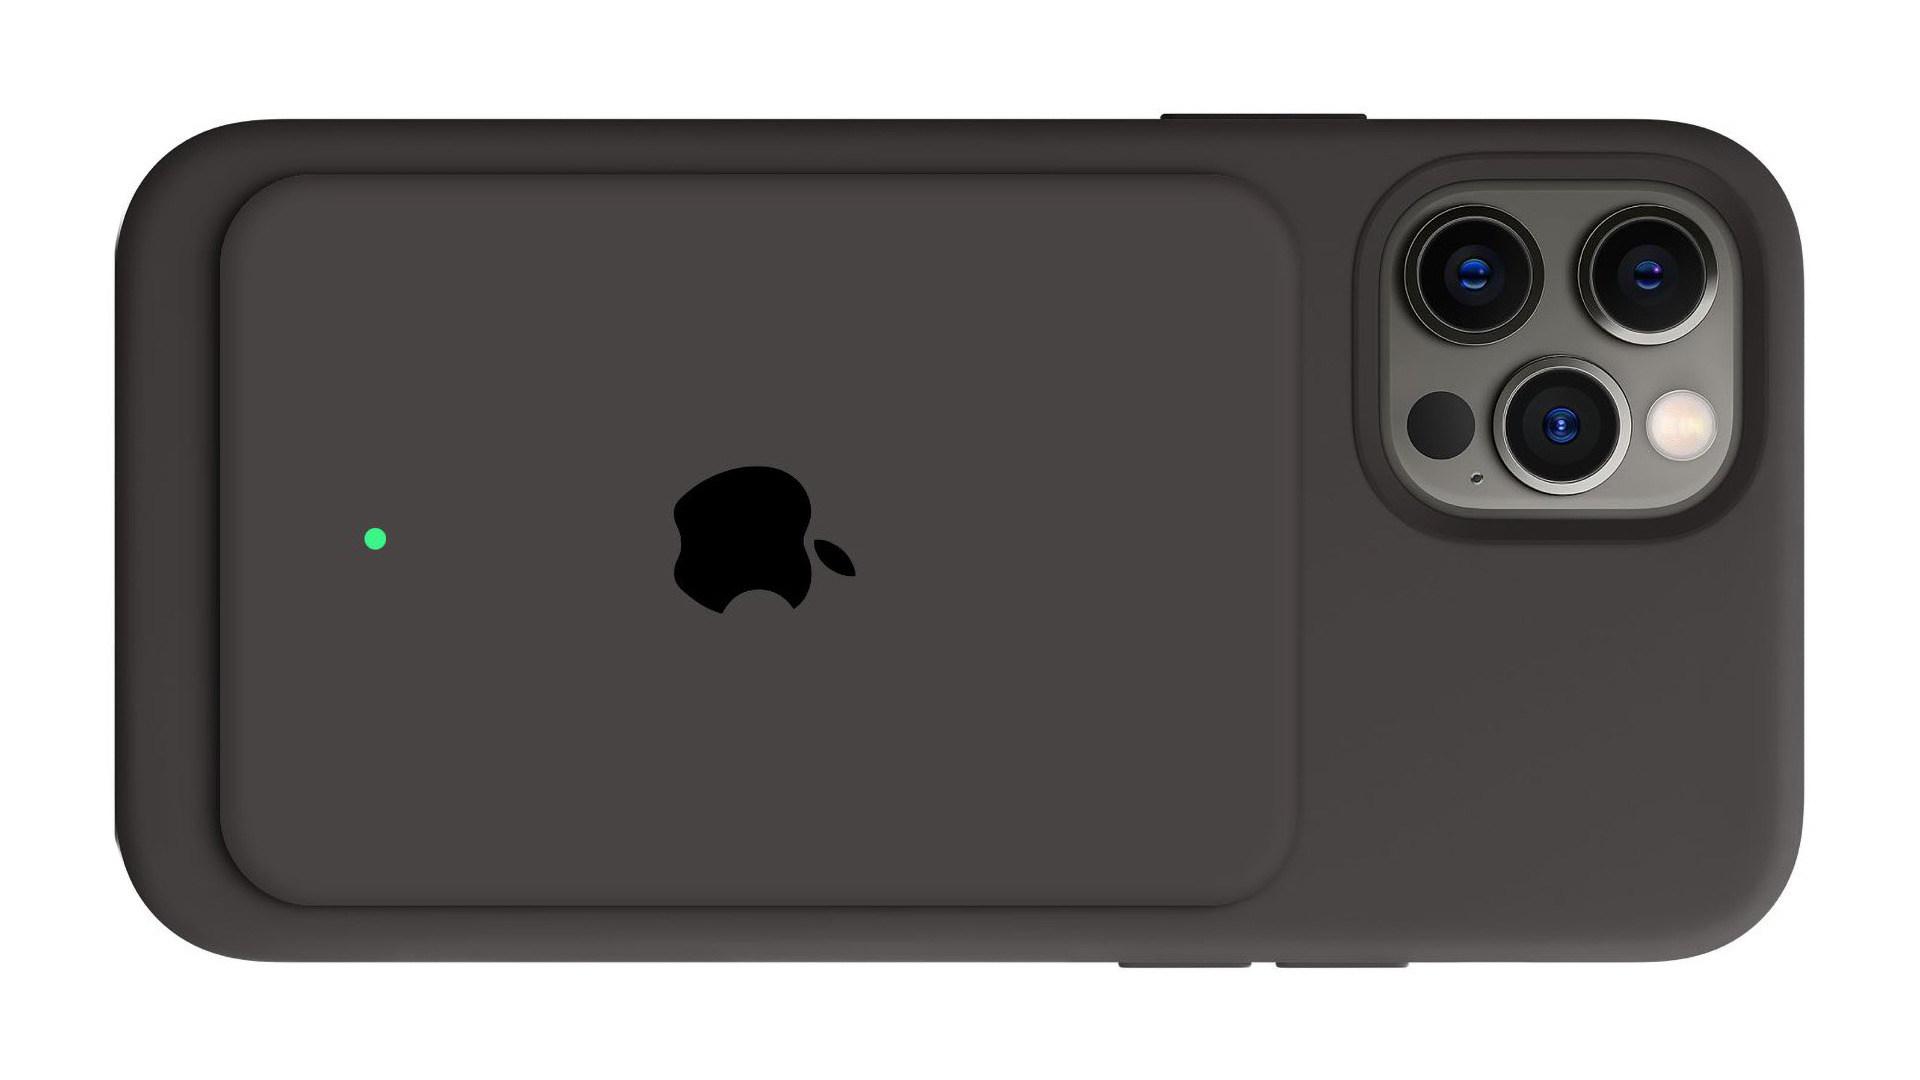 Apple, Smartphones, Akku, Batterie, Strom, Zubehör, iPhone 12 Pro, Akkupack, MagSafe, Battery